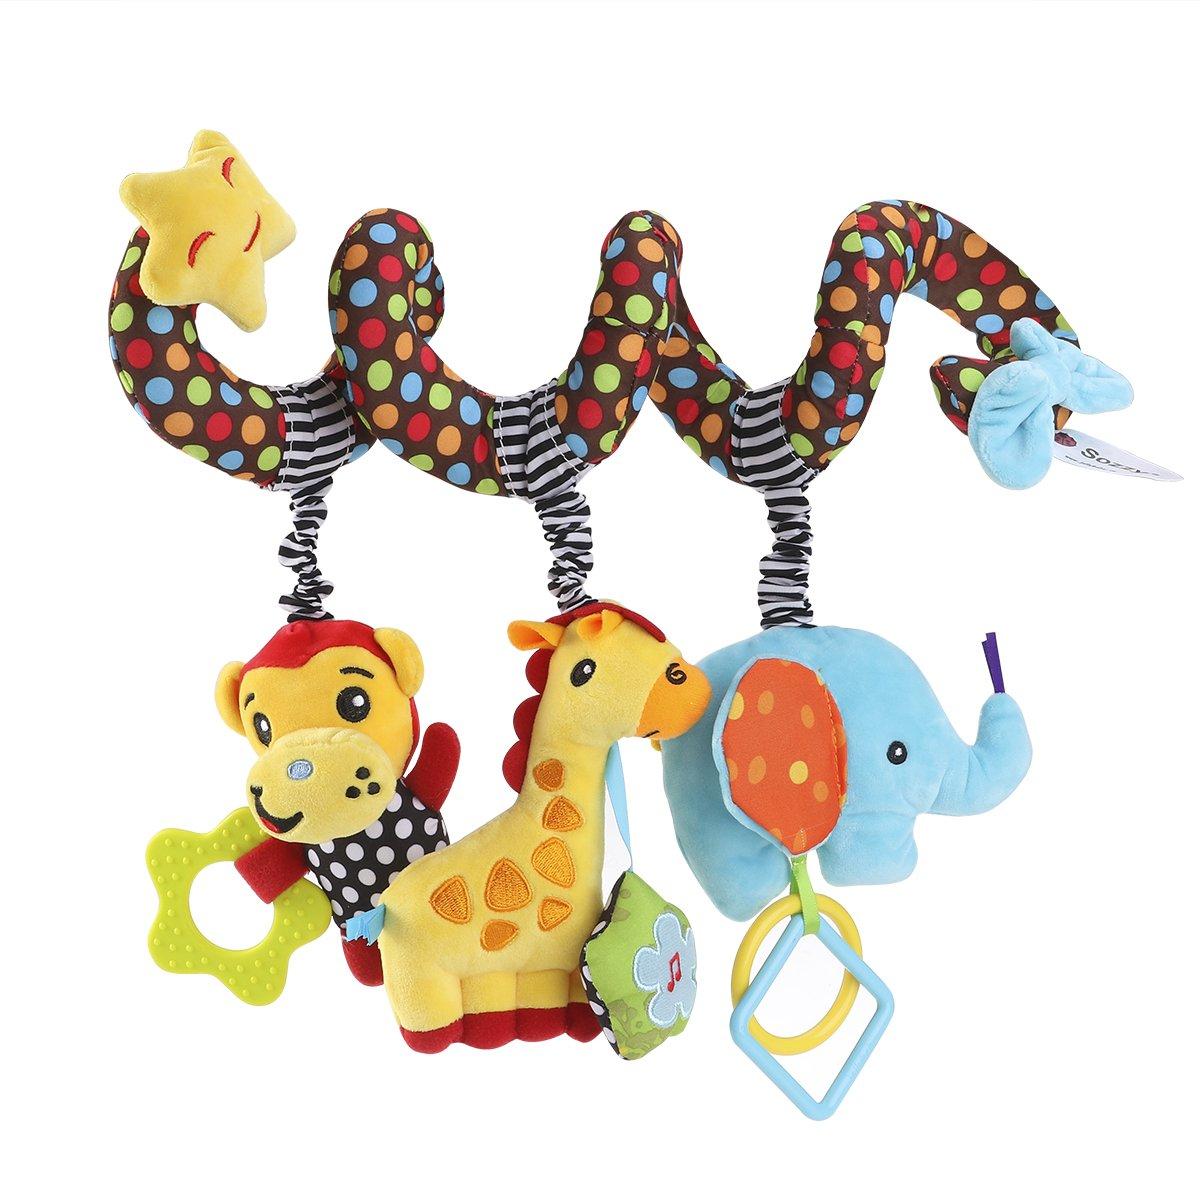 TOYMYTOY Spiral Stroller Elephant Educational